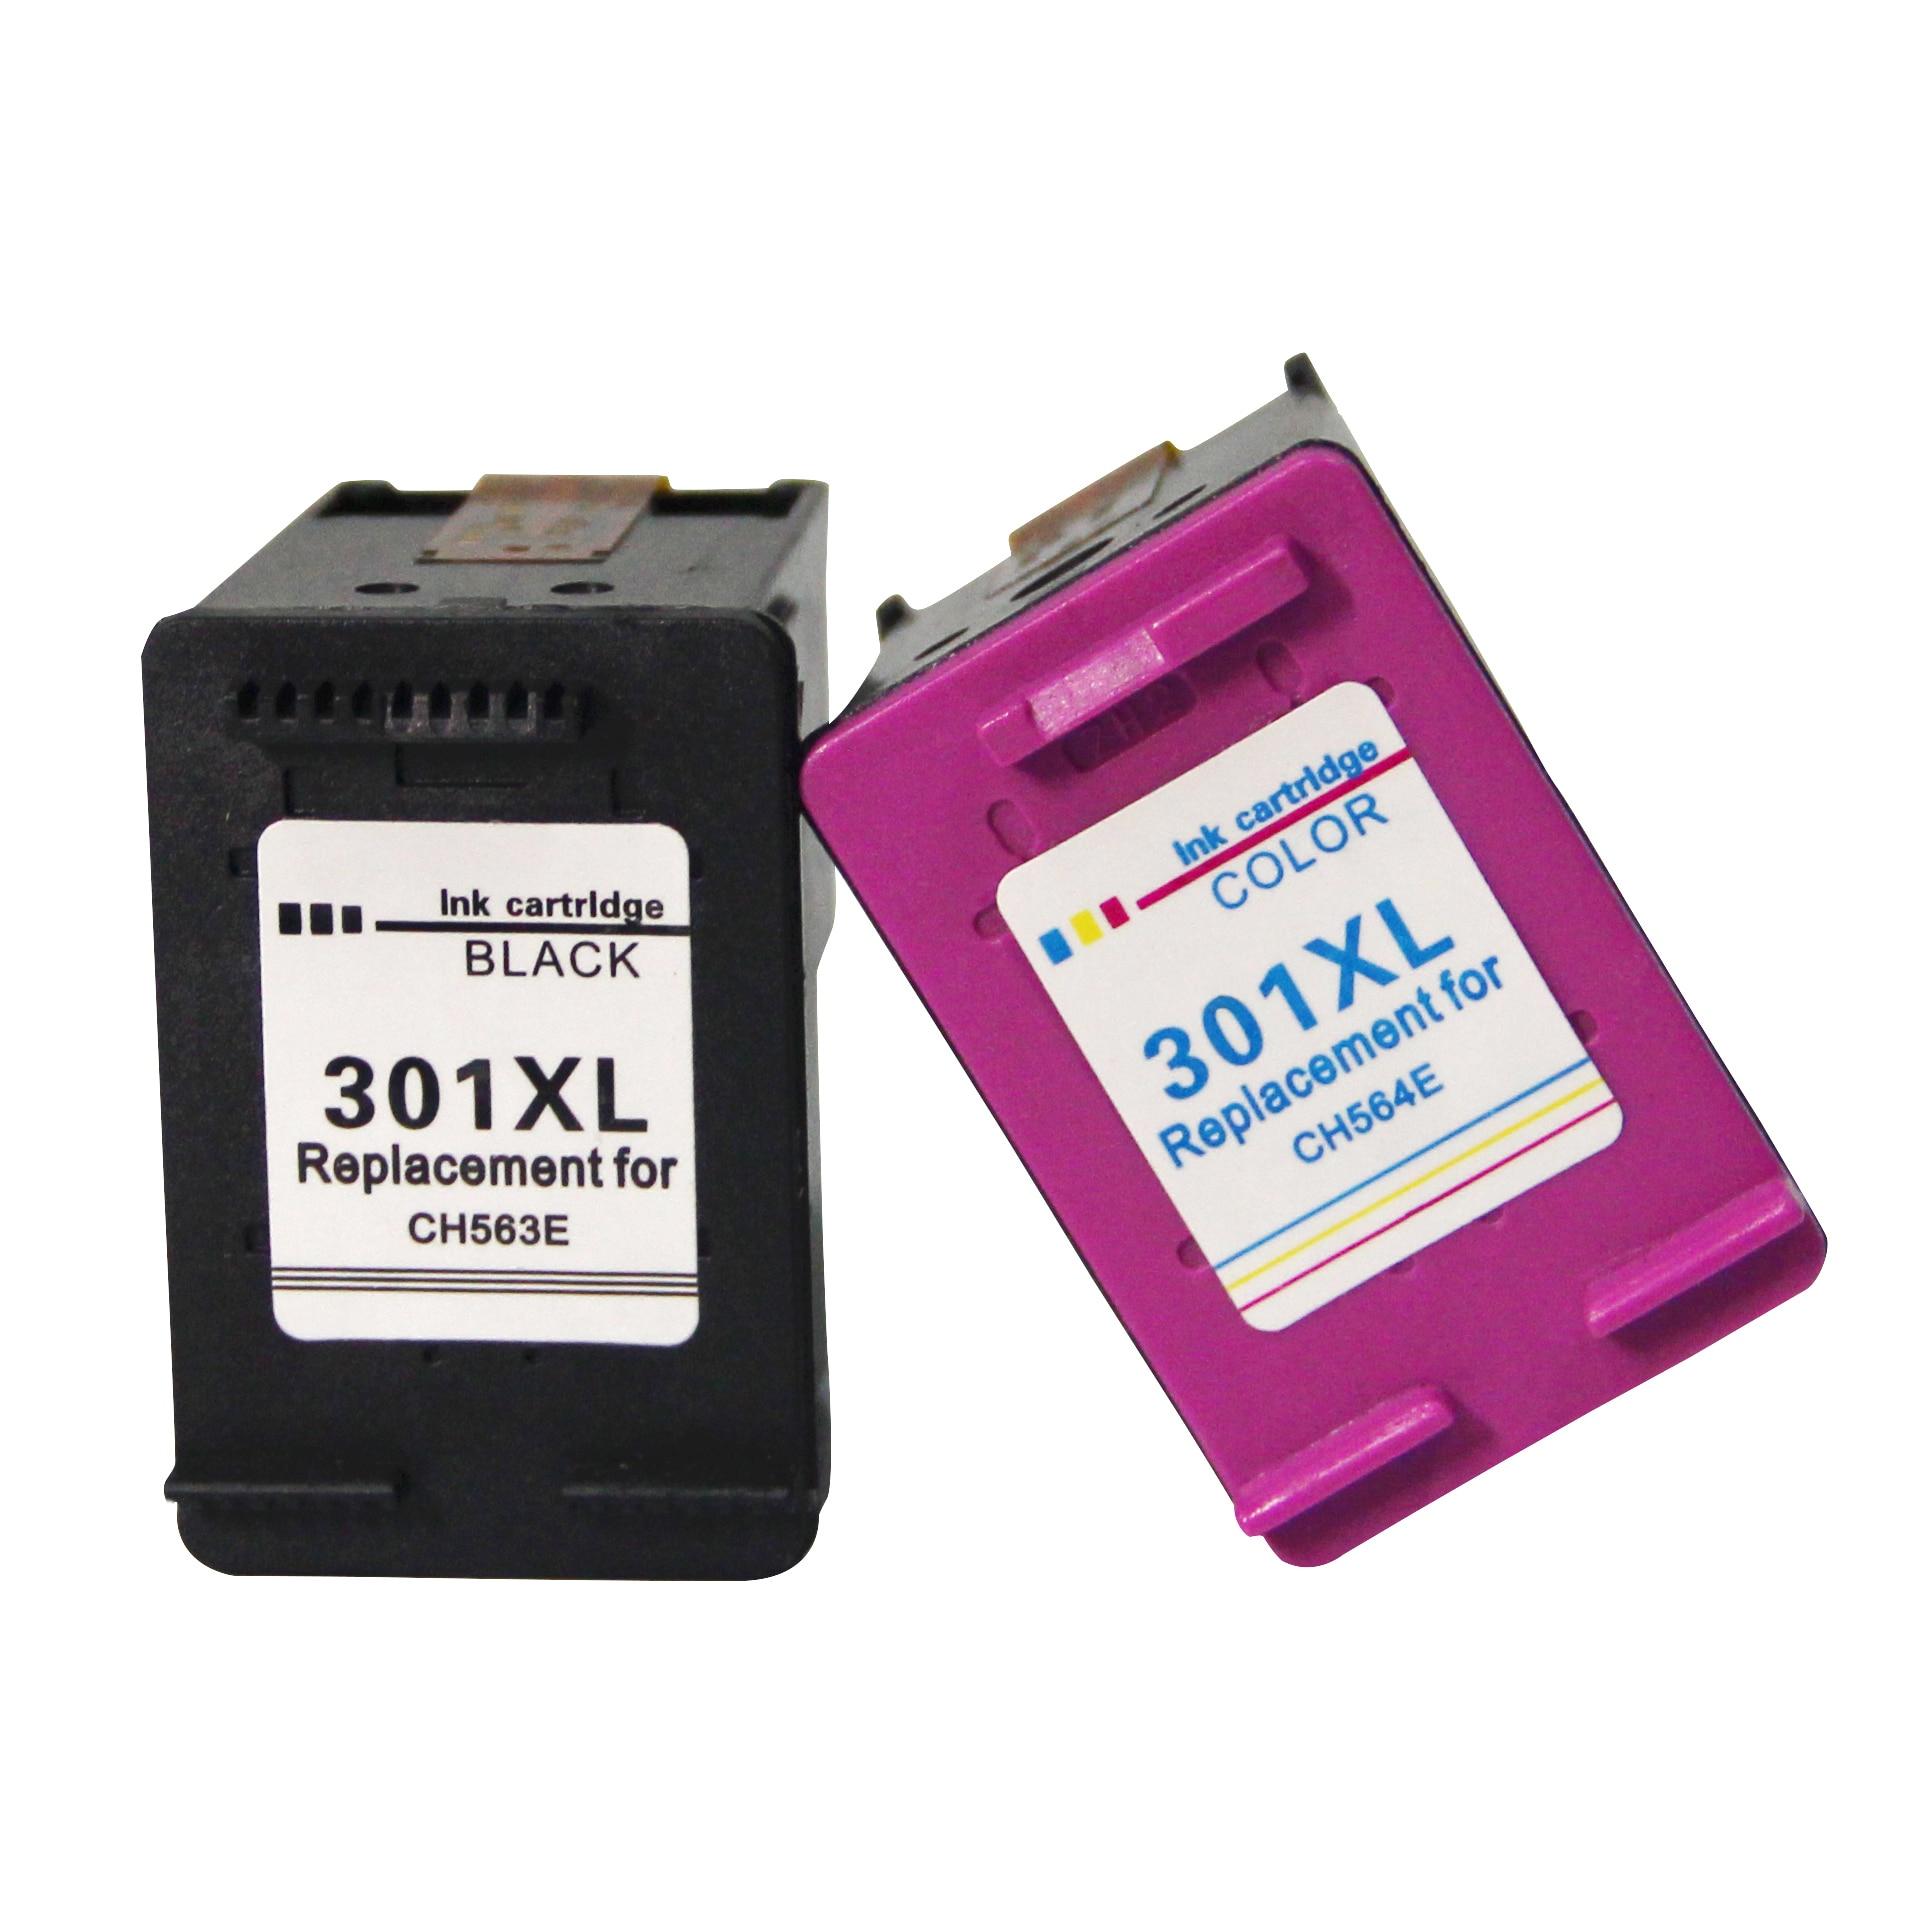 301XL rigenerata Cartucce di Inchiostro per HP 301 per HP Deskjet 1000 1050 2000 2050 2050S 2510 3510 3050 3050a stampanti